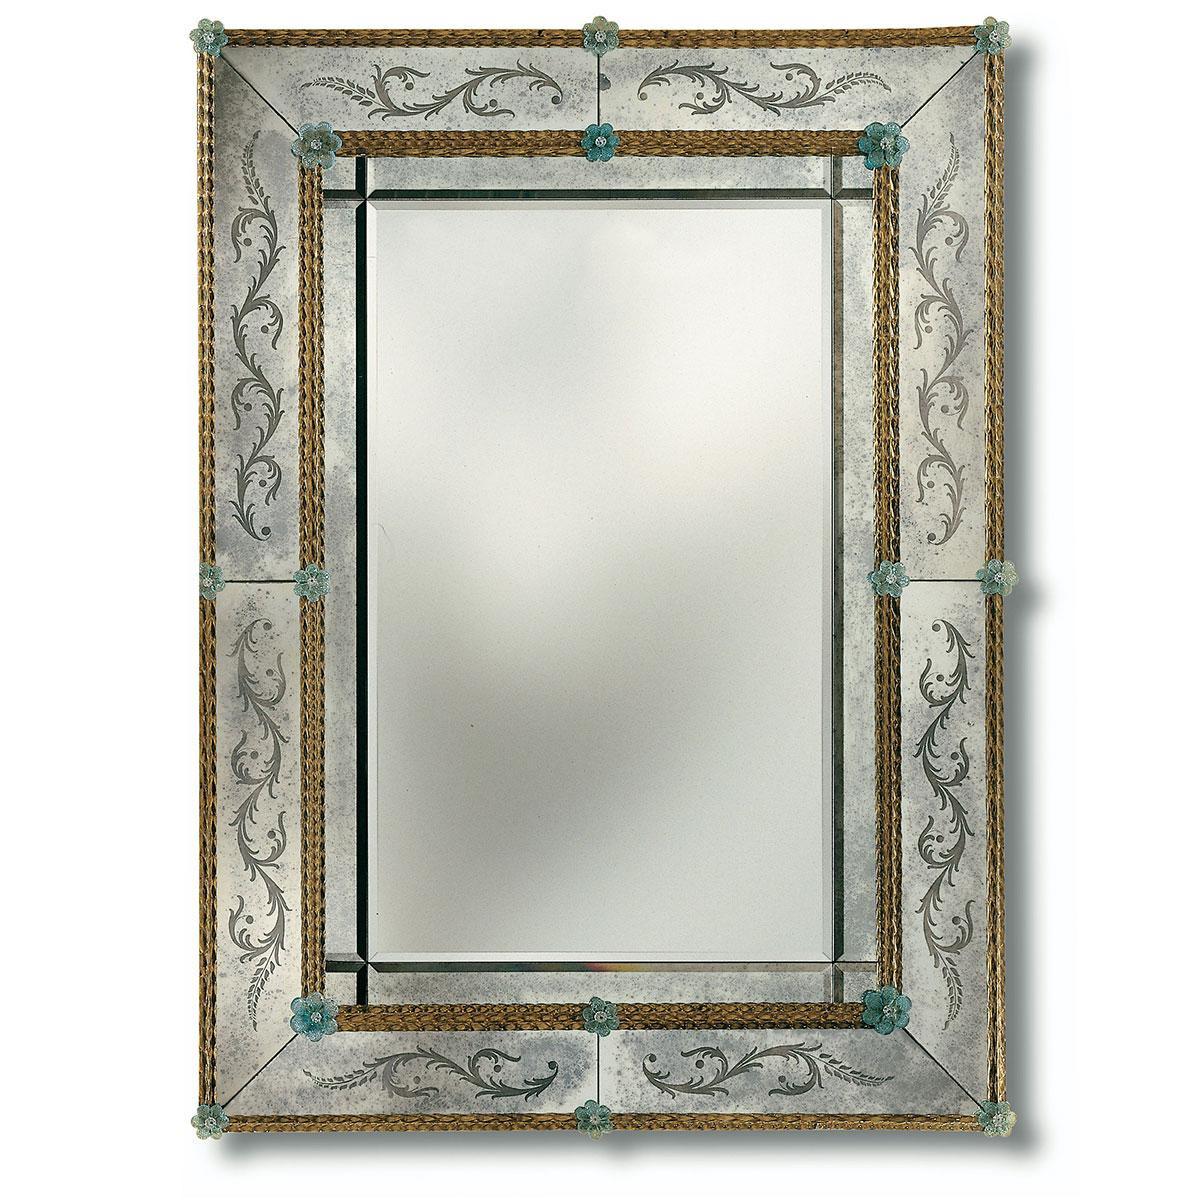 """Angelica"" Murano glas venezianischen spiegel"